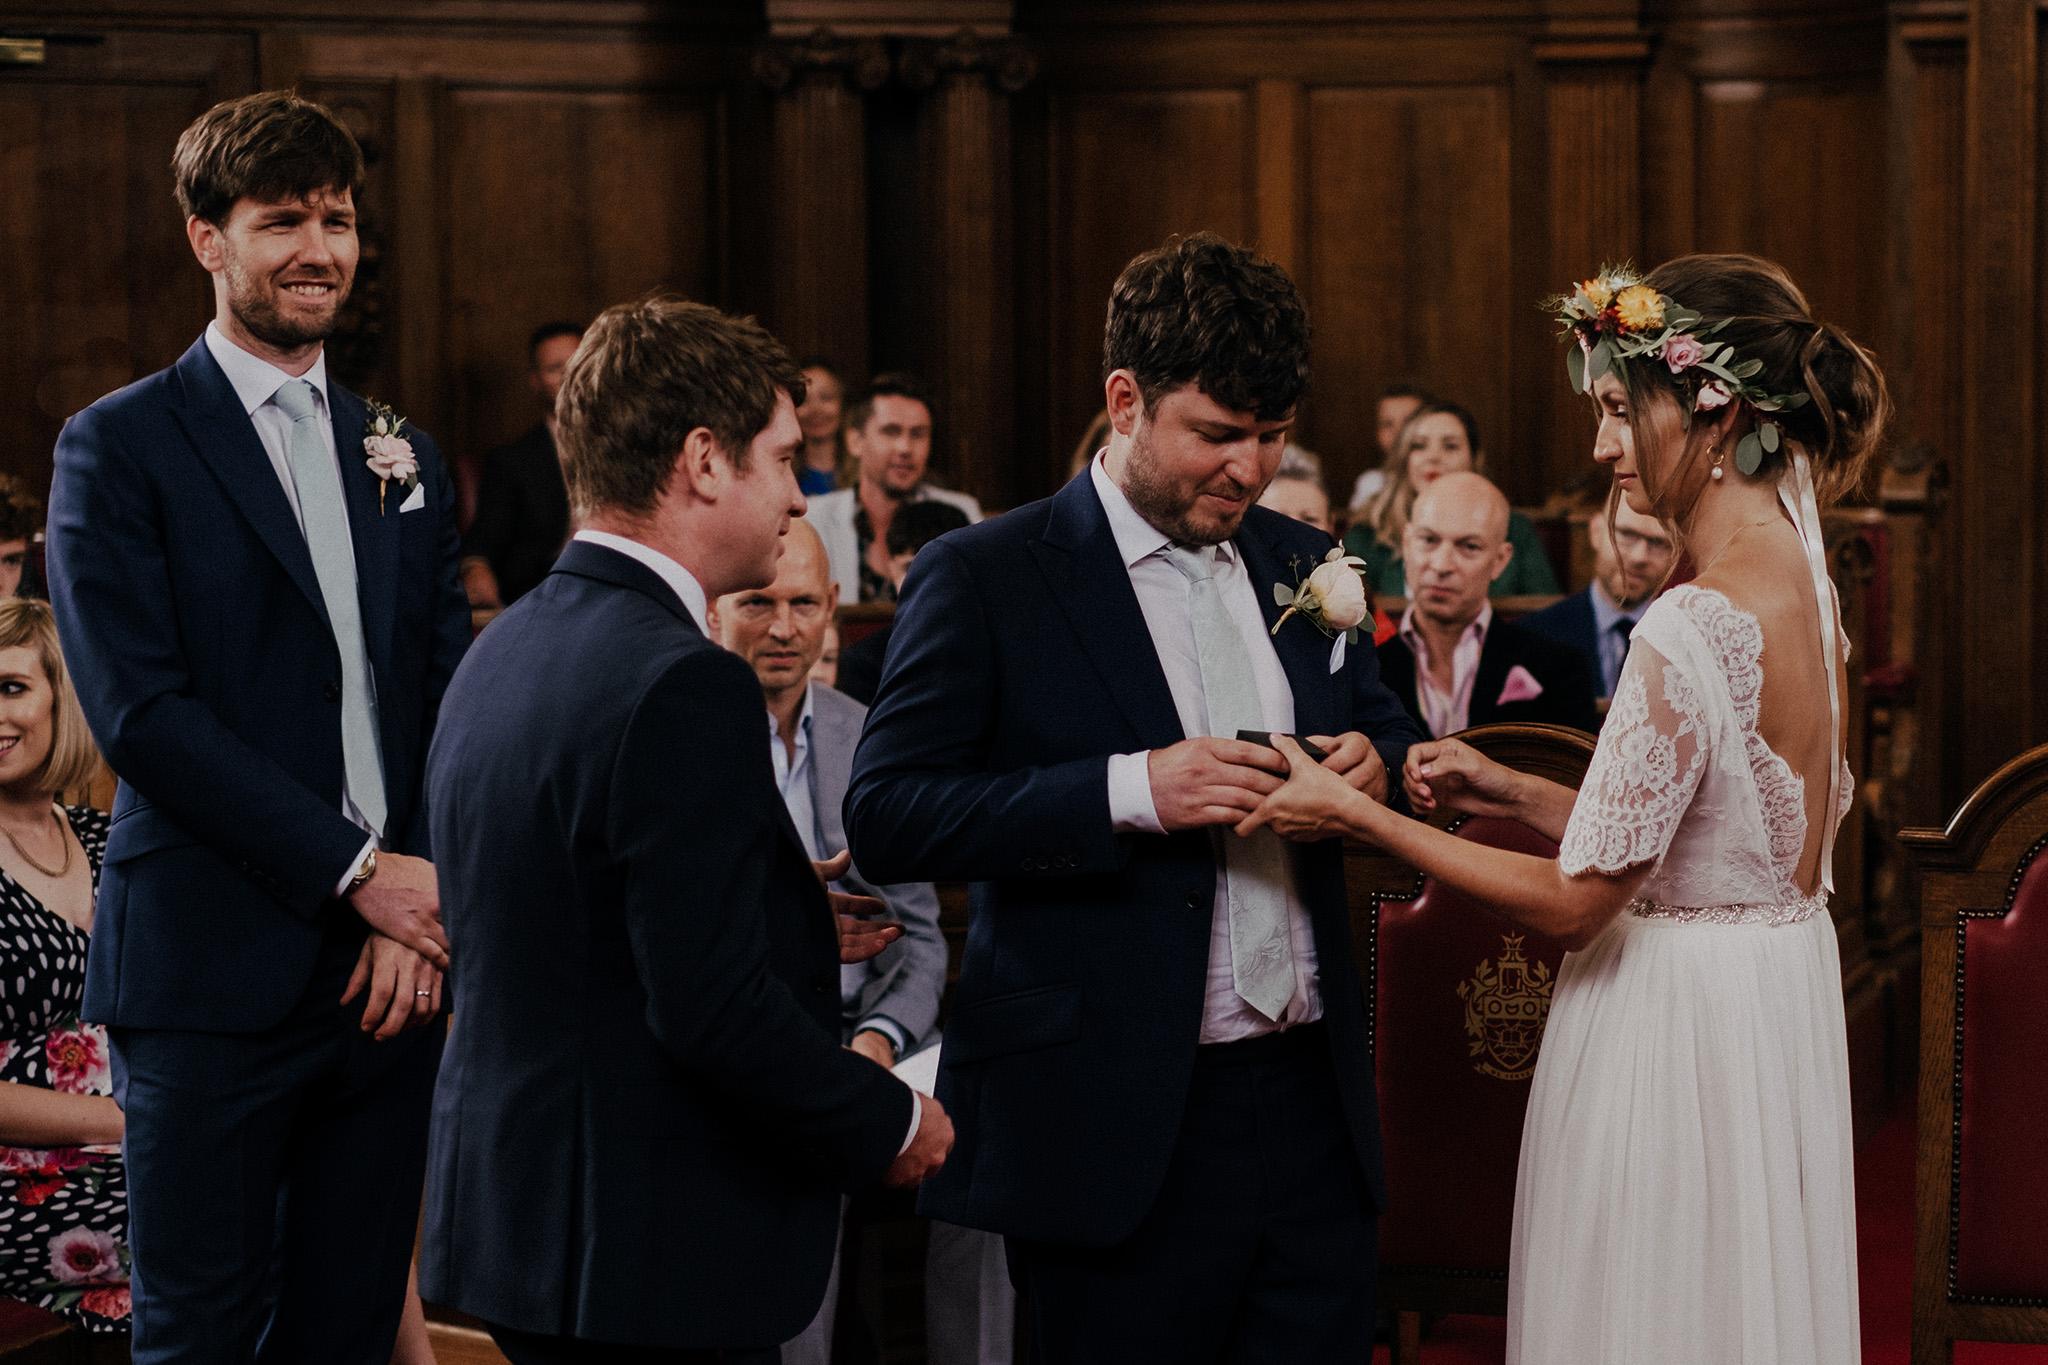 Islington-town-hall-wedding36.jpg